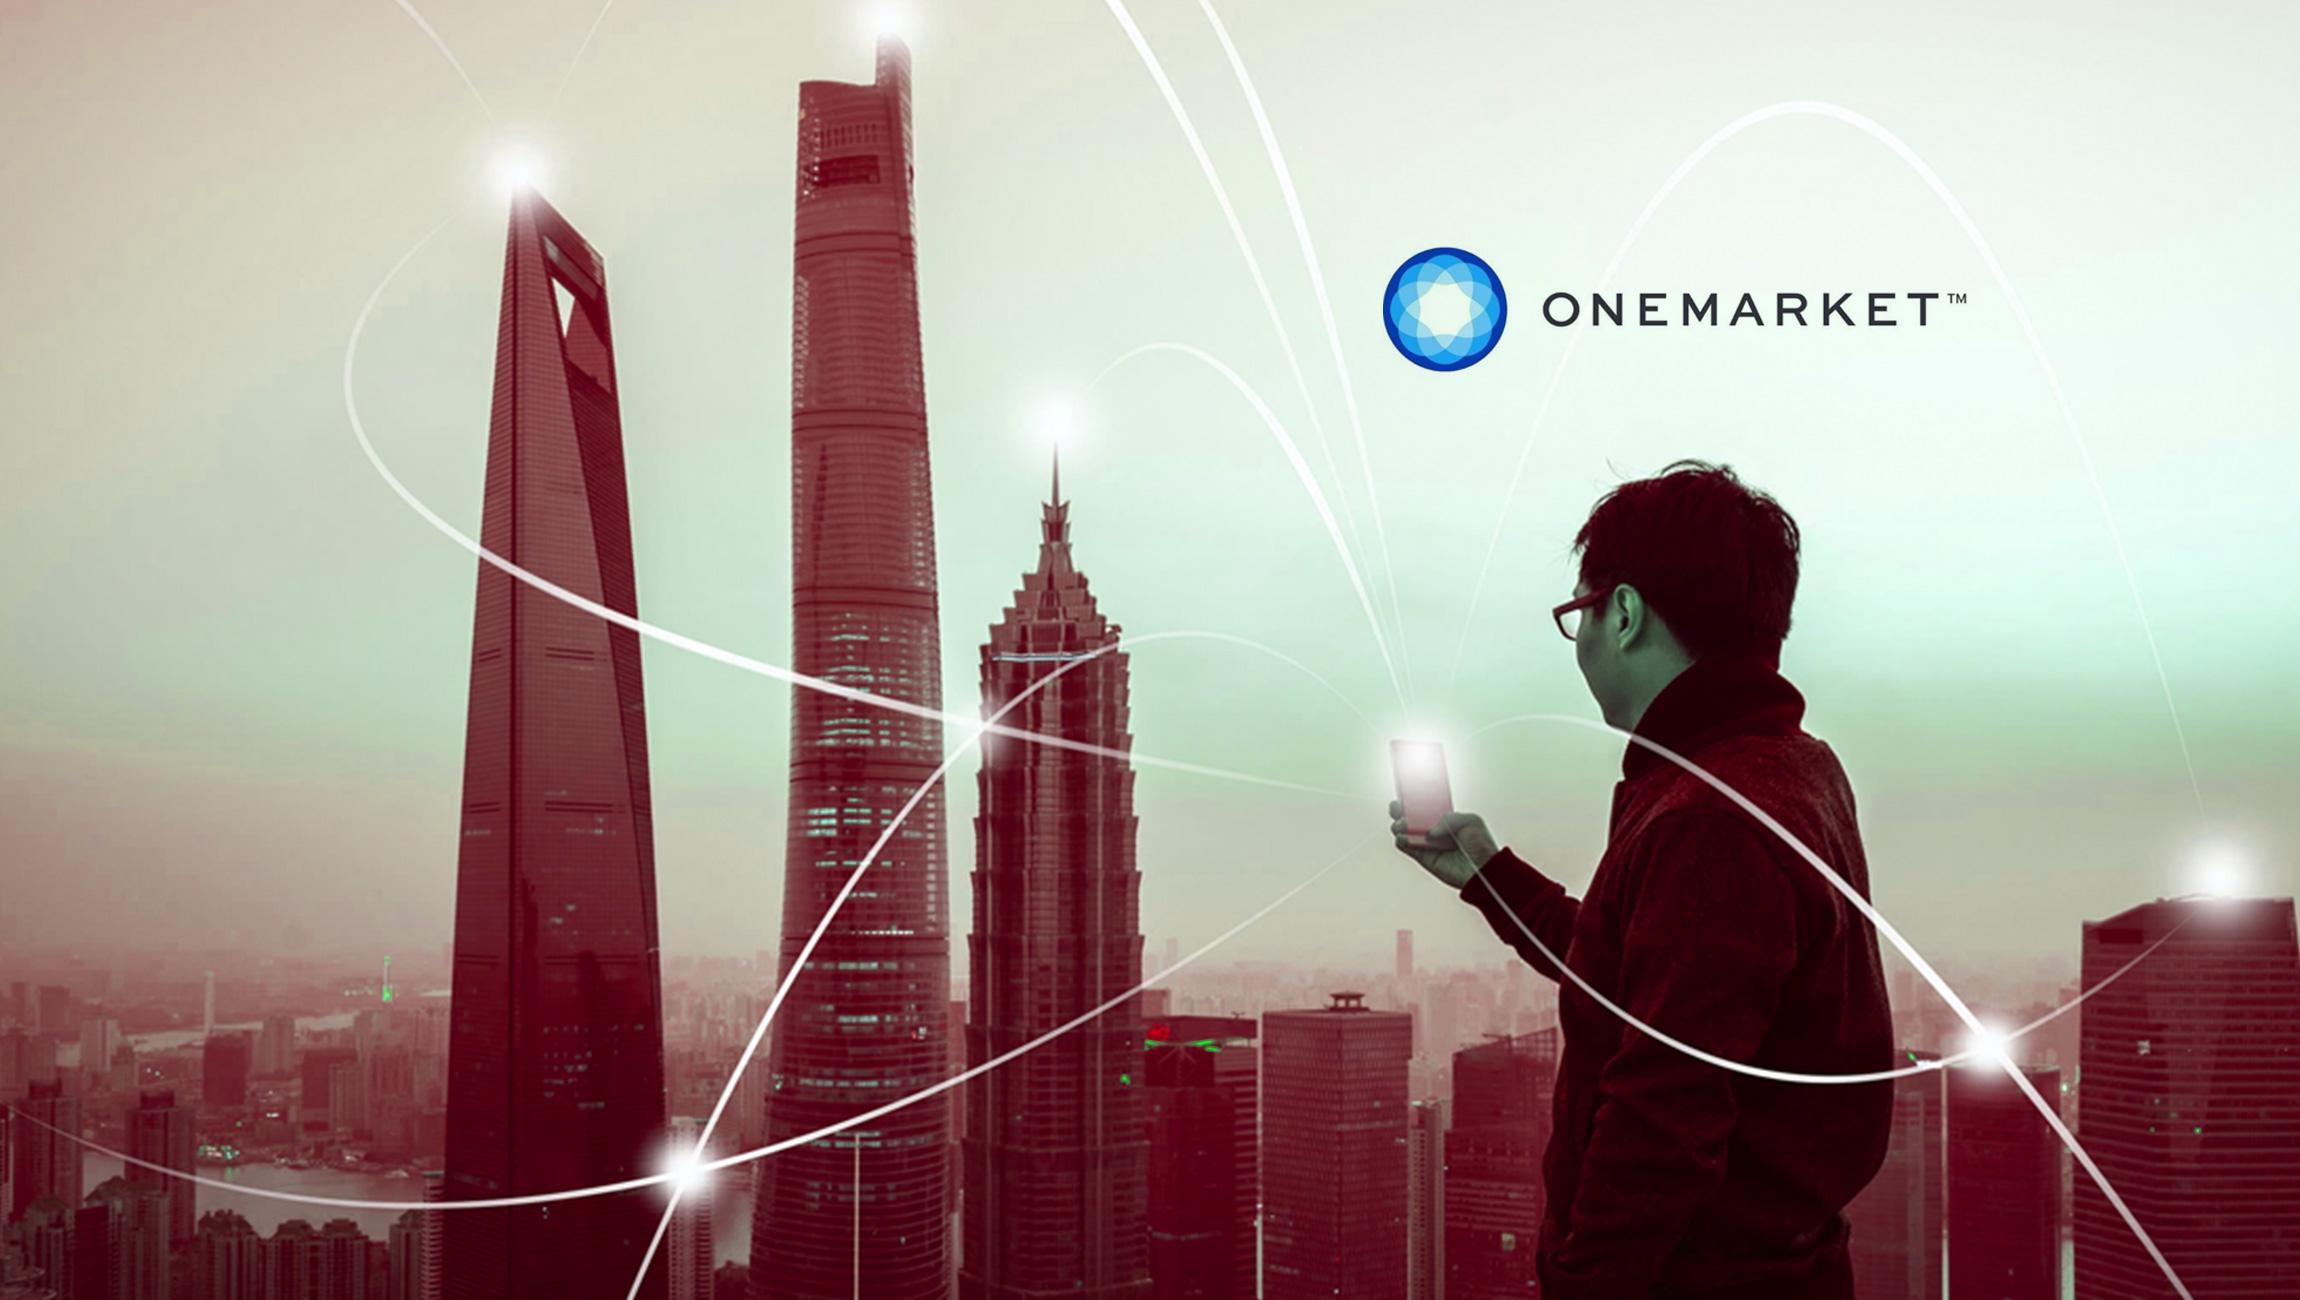 OneMarket Introduces Customer Activation Platform Dedicated to Retail